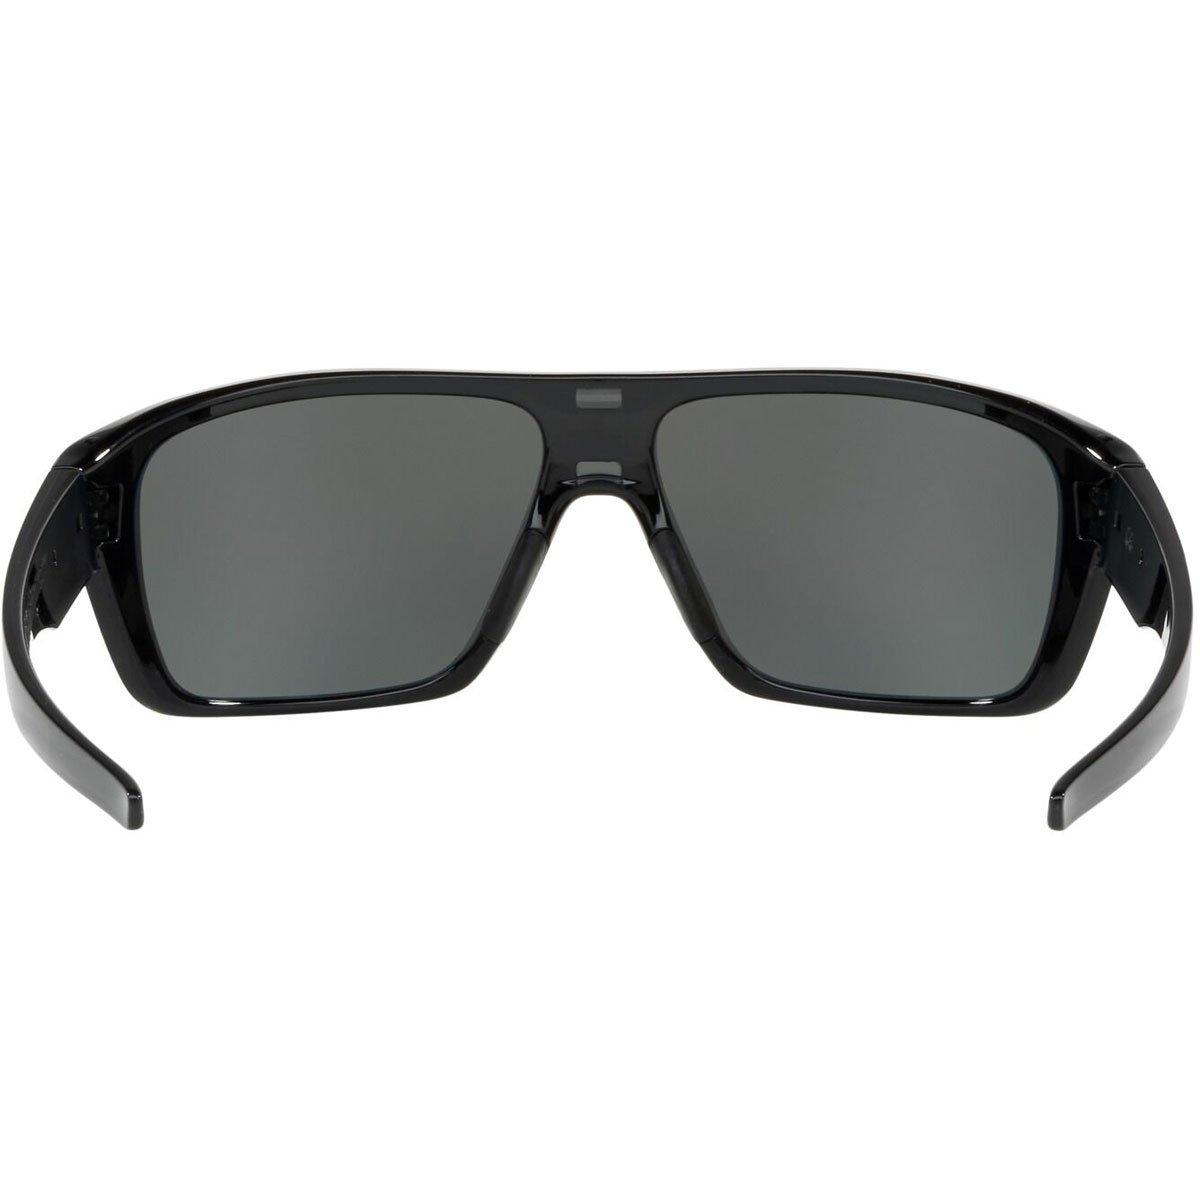 f40a3e0a90 Amazon.com  Oakley Men s Straightback Polarized Iridium Rectangular  Sunglasses